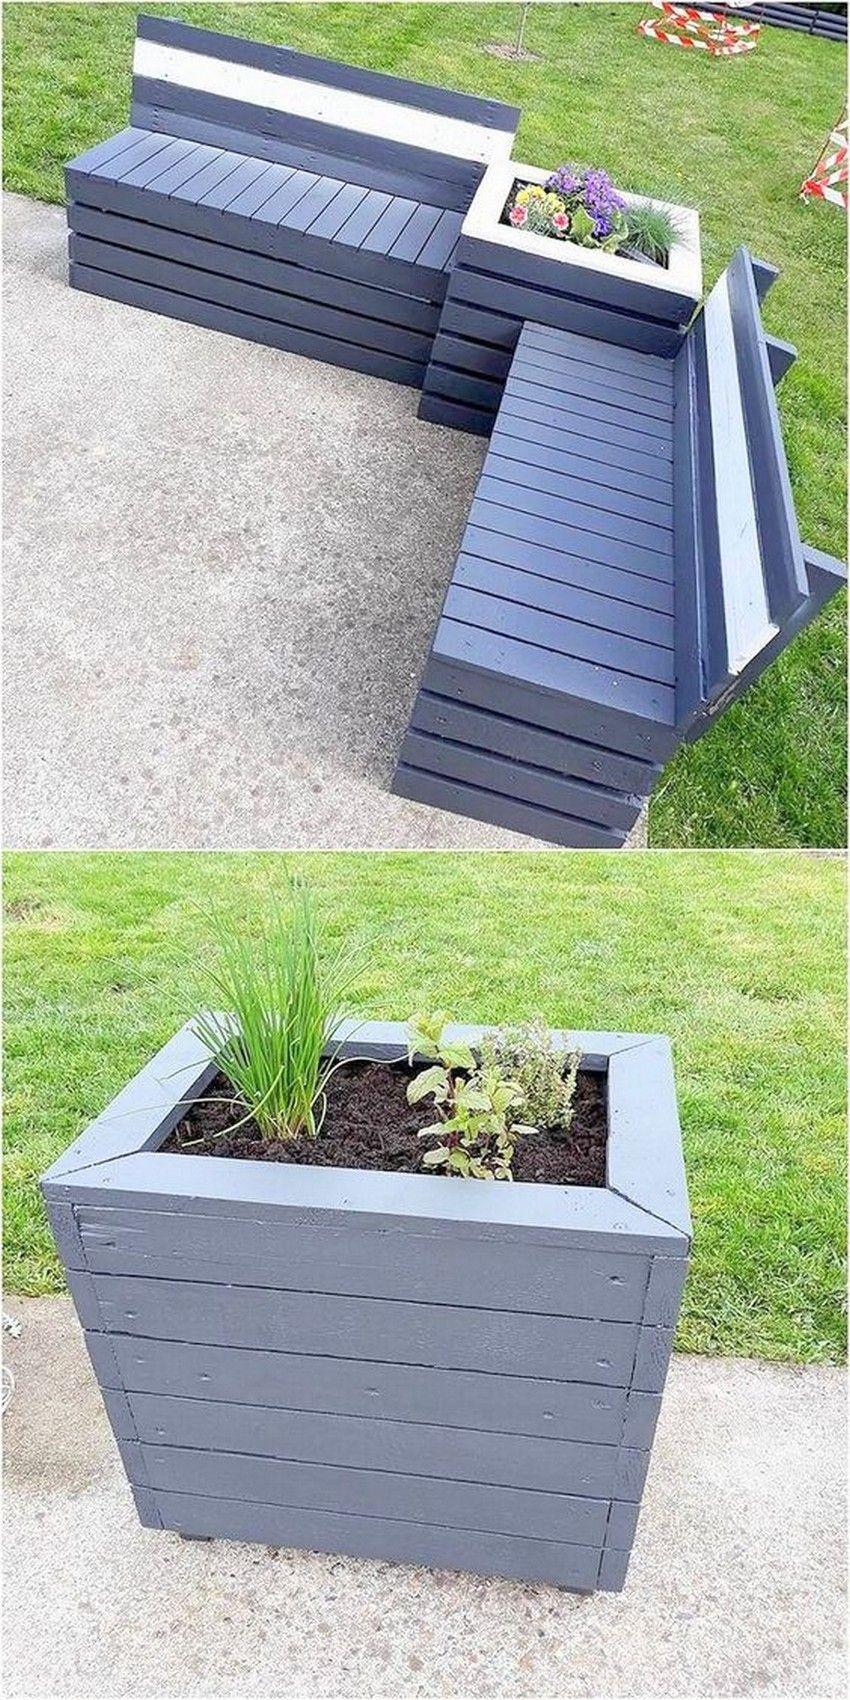 List of Great DIY Furniture from bingefashion.com